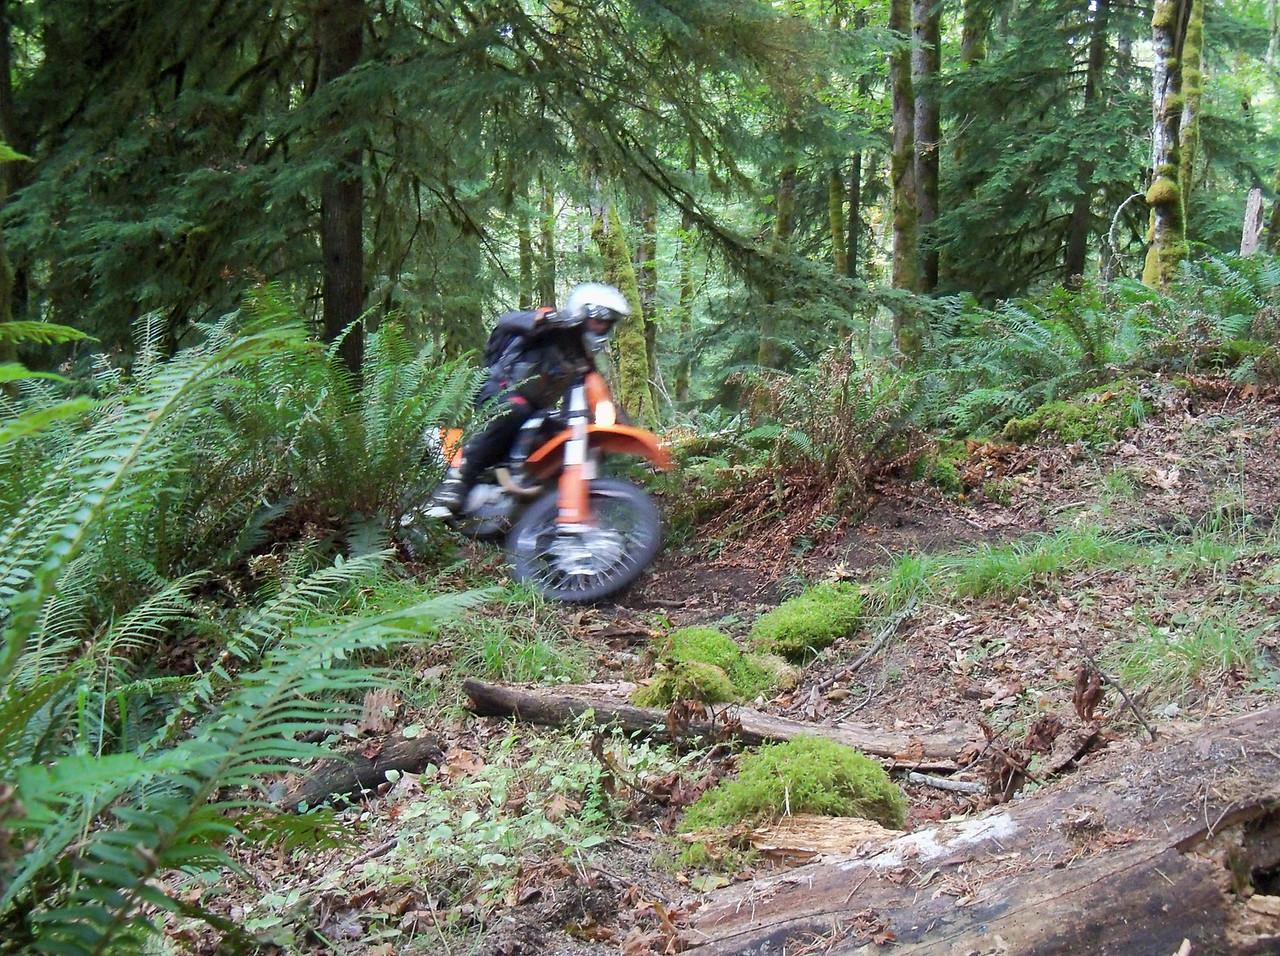 Steve riding the Krause Ridge Trail